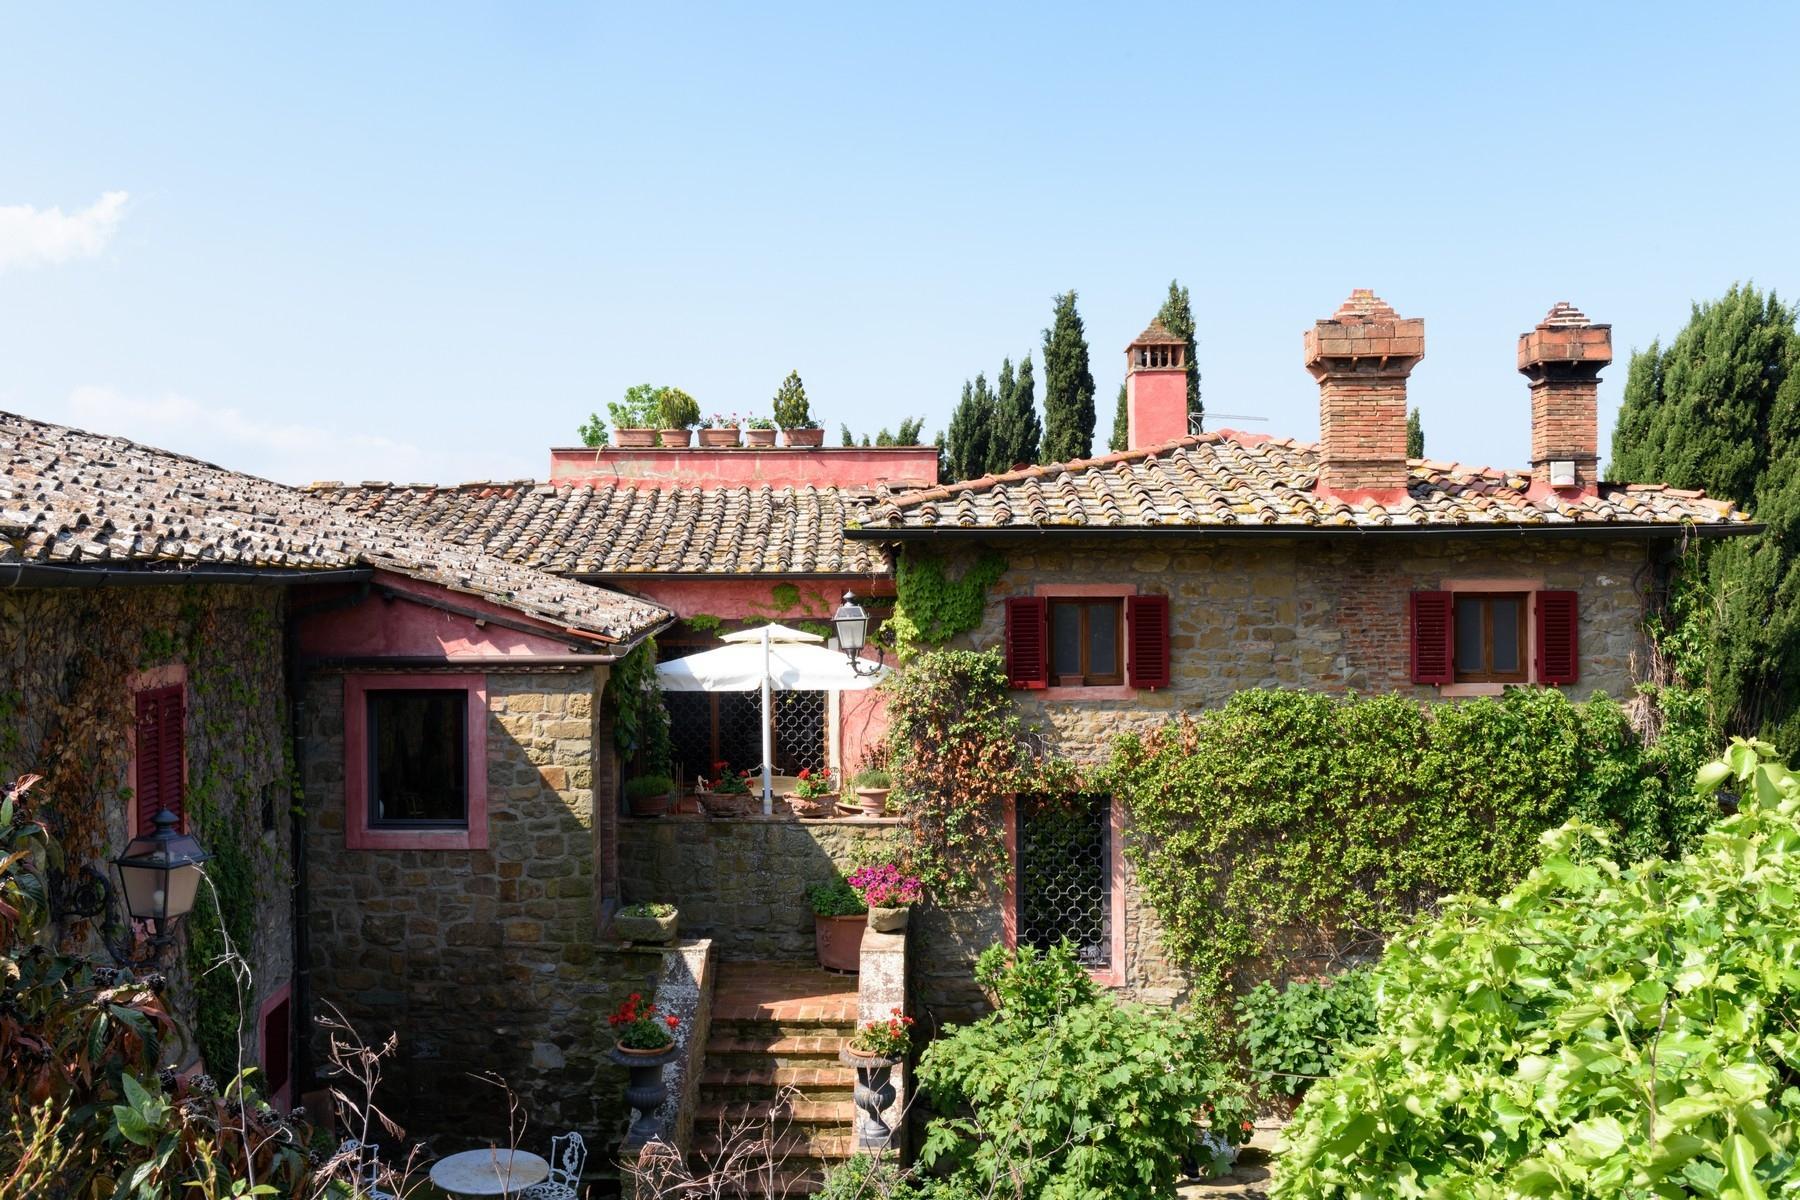 Wichtige Weinanbaubetriebe im Chianti-Gebiet - 2